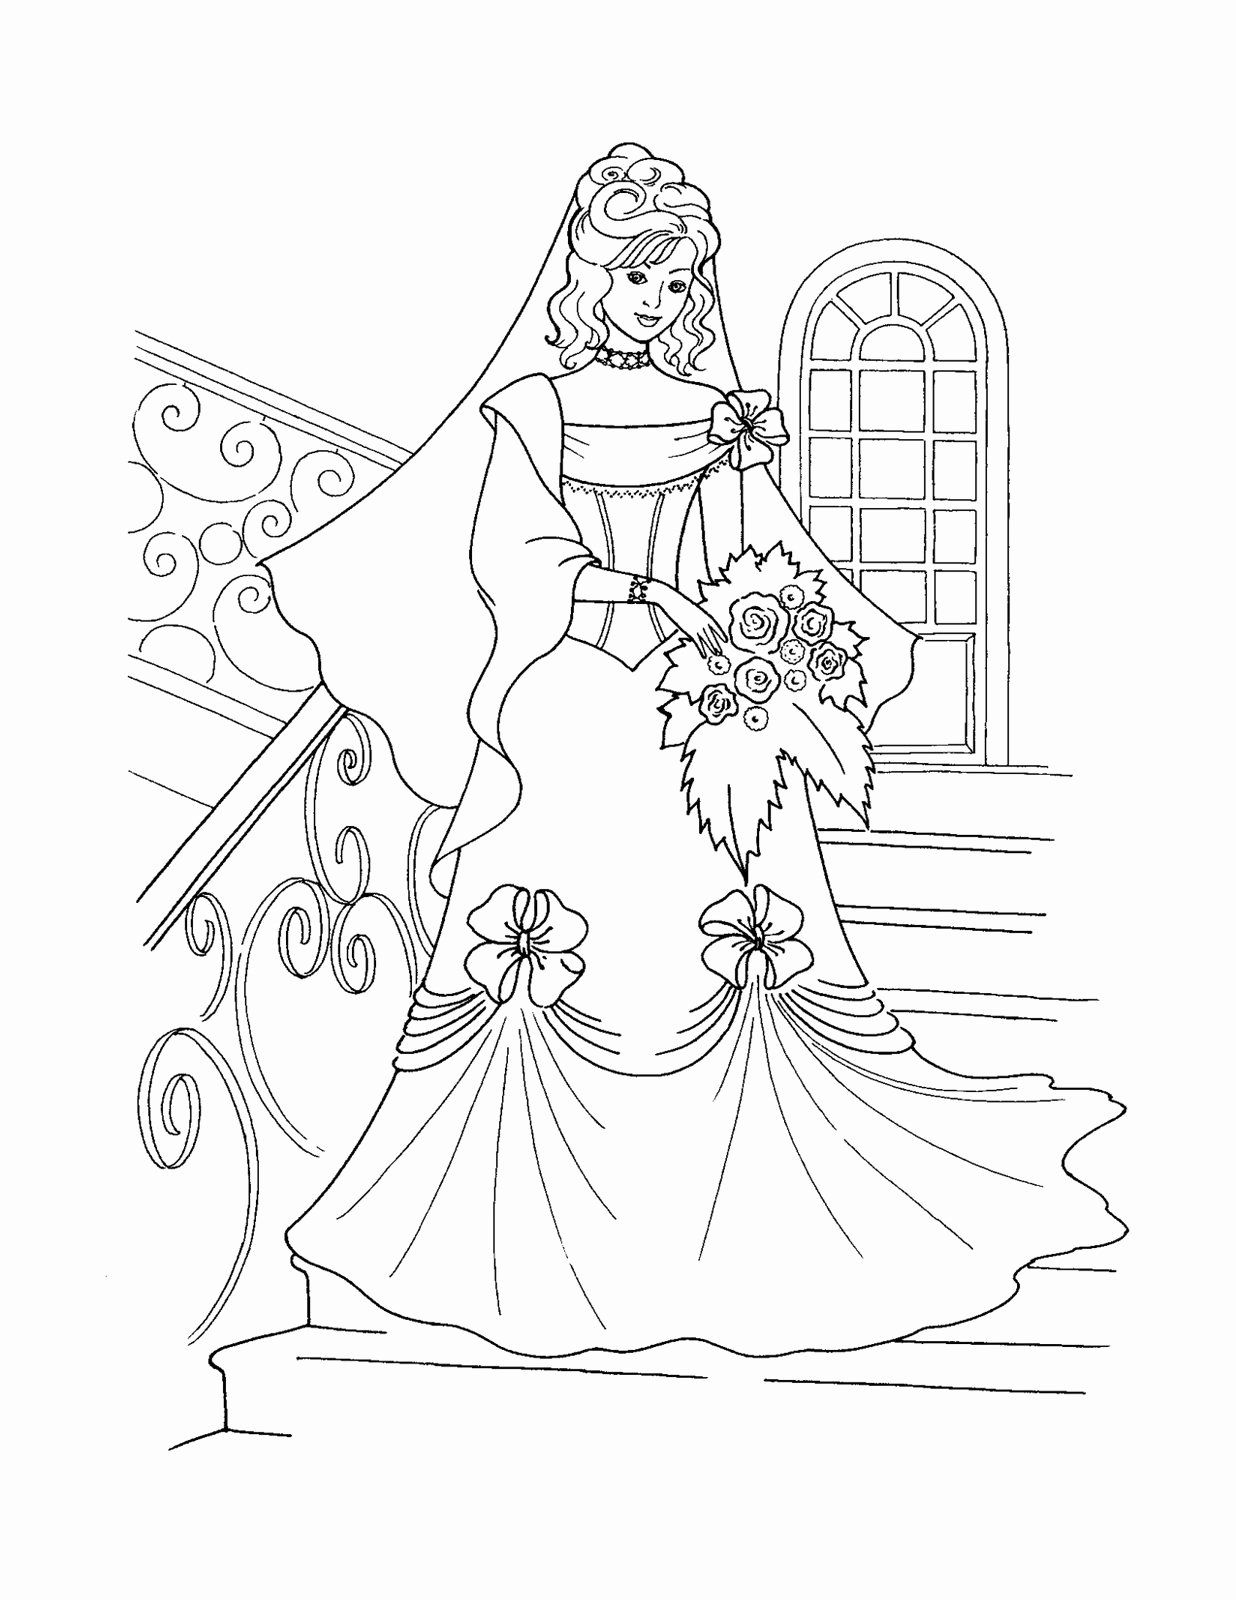 Princess Bride Coloring Book Elegant Princess Coloring Pages Best Coloring Pages Disney Princess Coloring Pages Princess Coloring Pages Wedding Coloring Pages